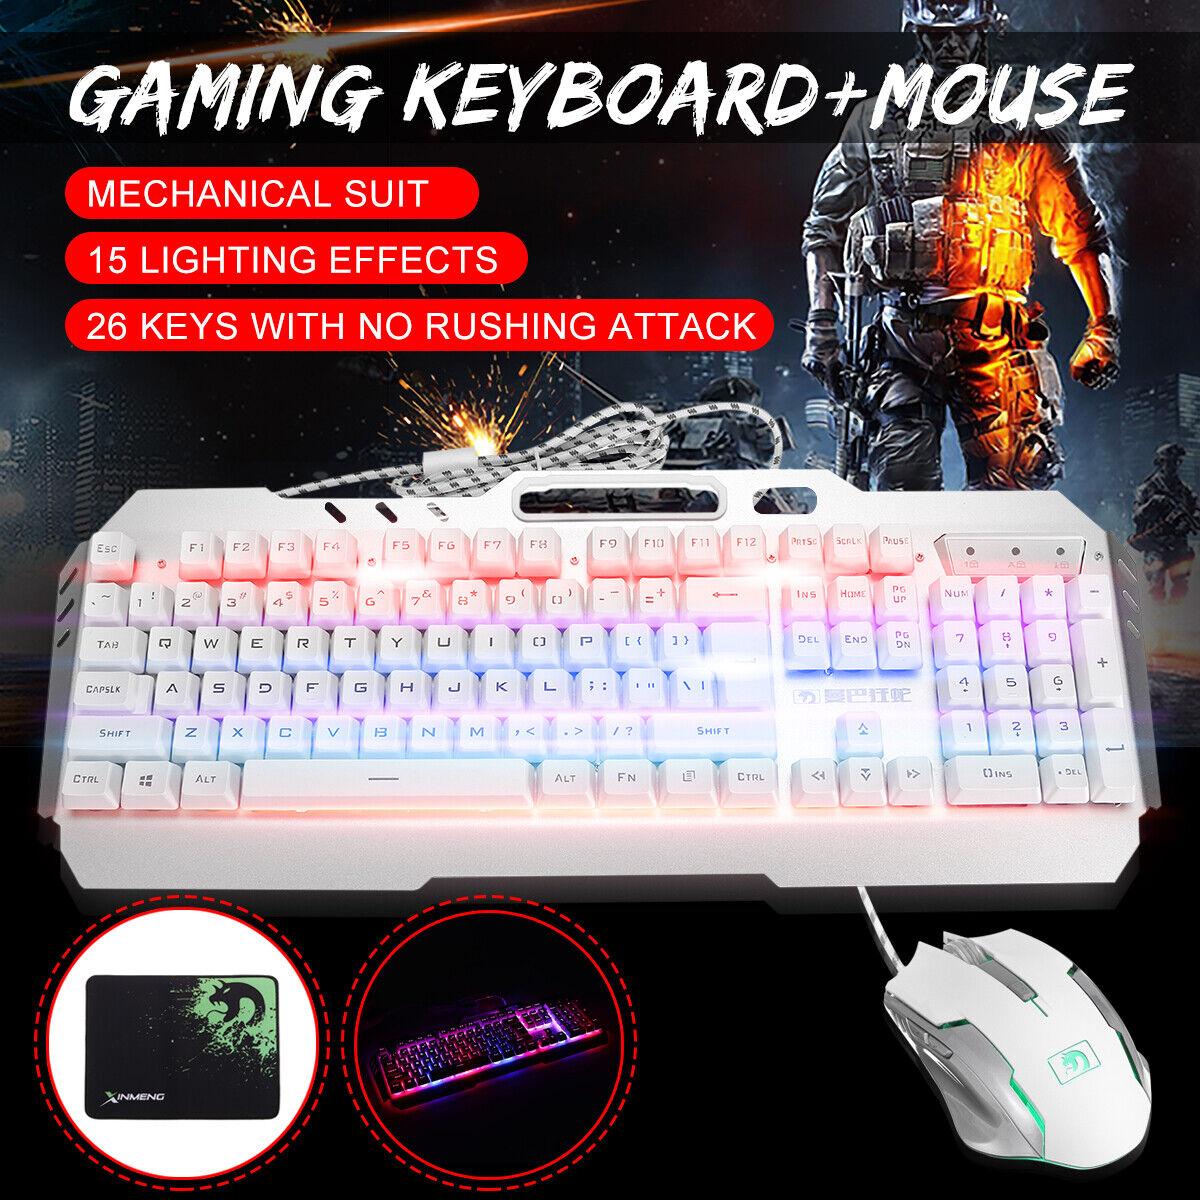 Gaming Keyboard + Mouse + Pad LED Backlit Mute Ergonomic Wir